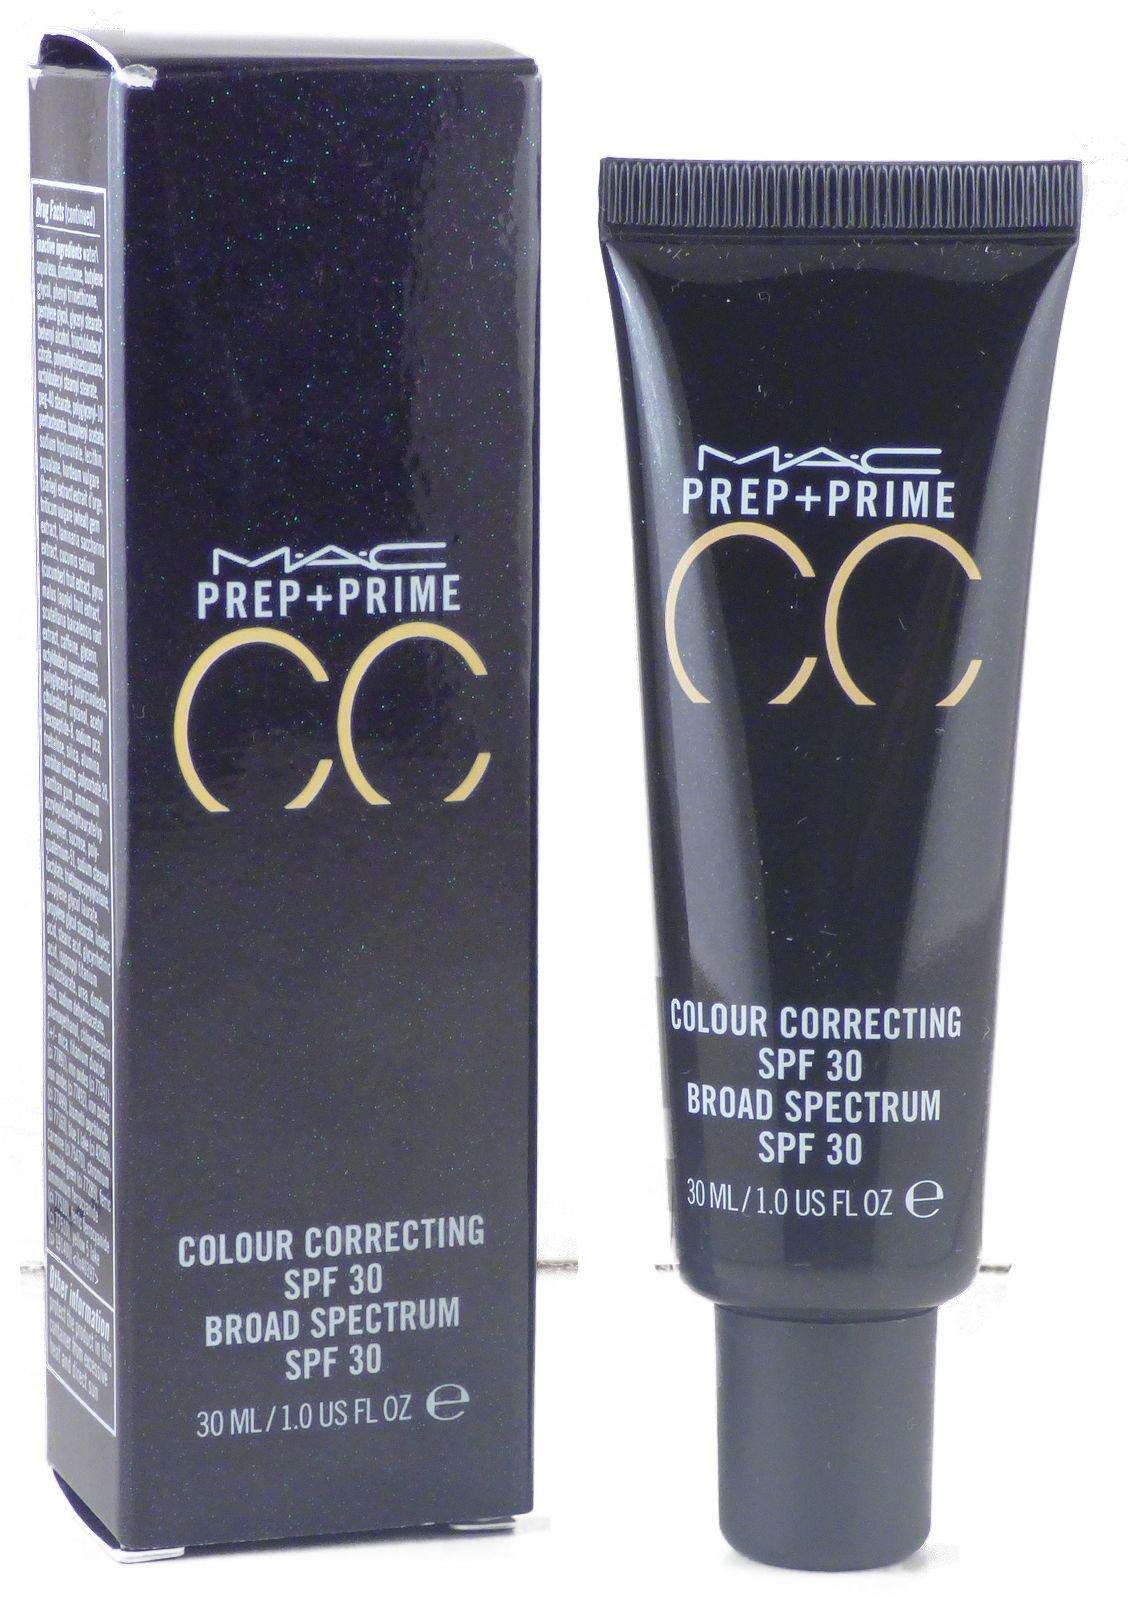 MAC Prep + Prime CC Colour Correcting ~ NEUTRALIZE